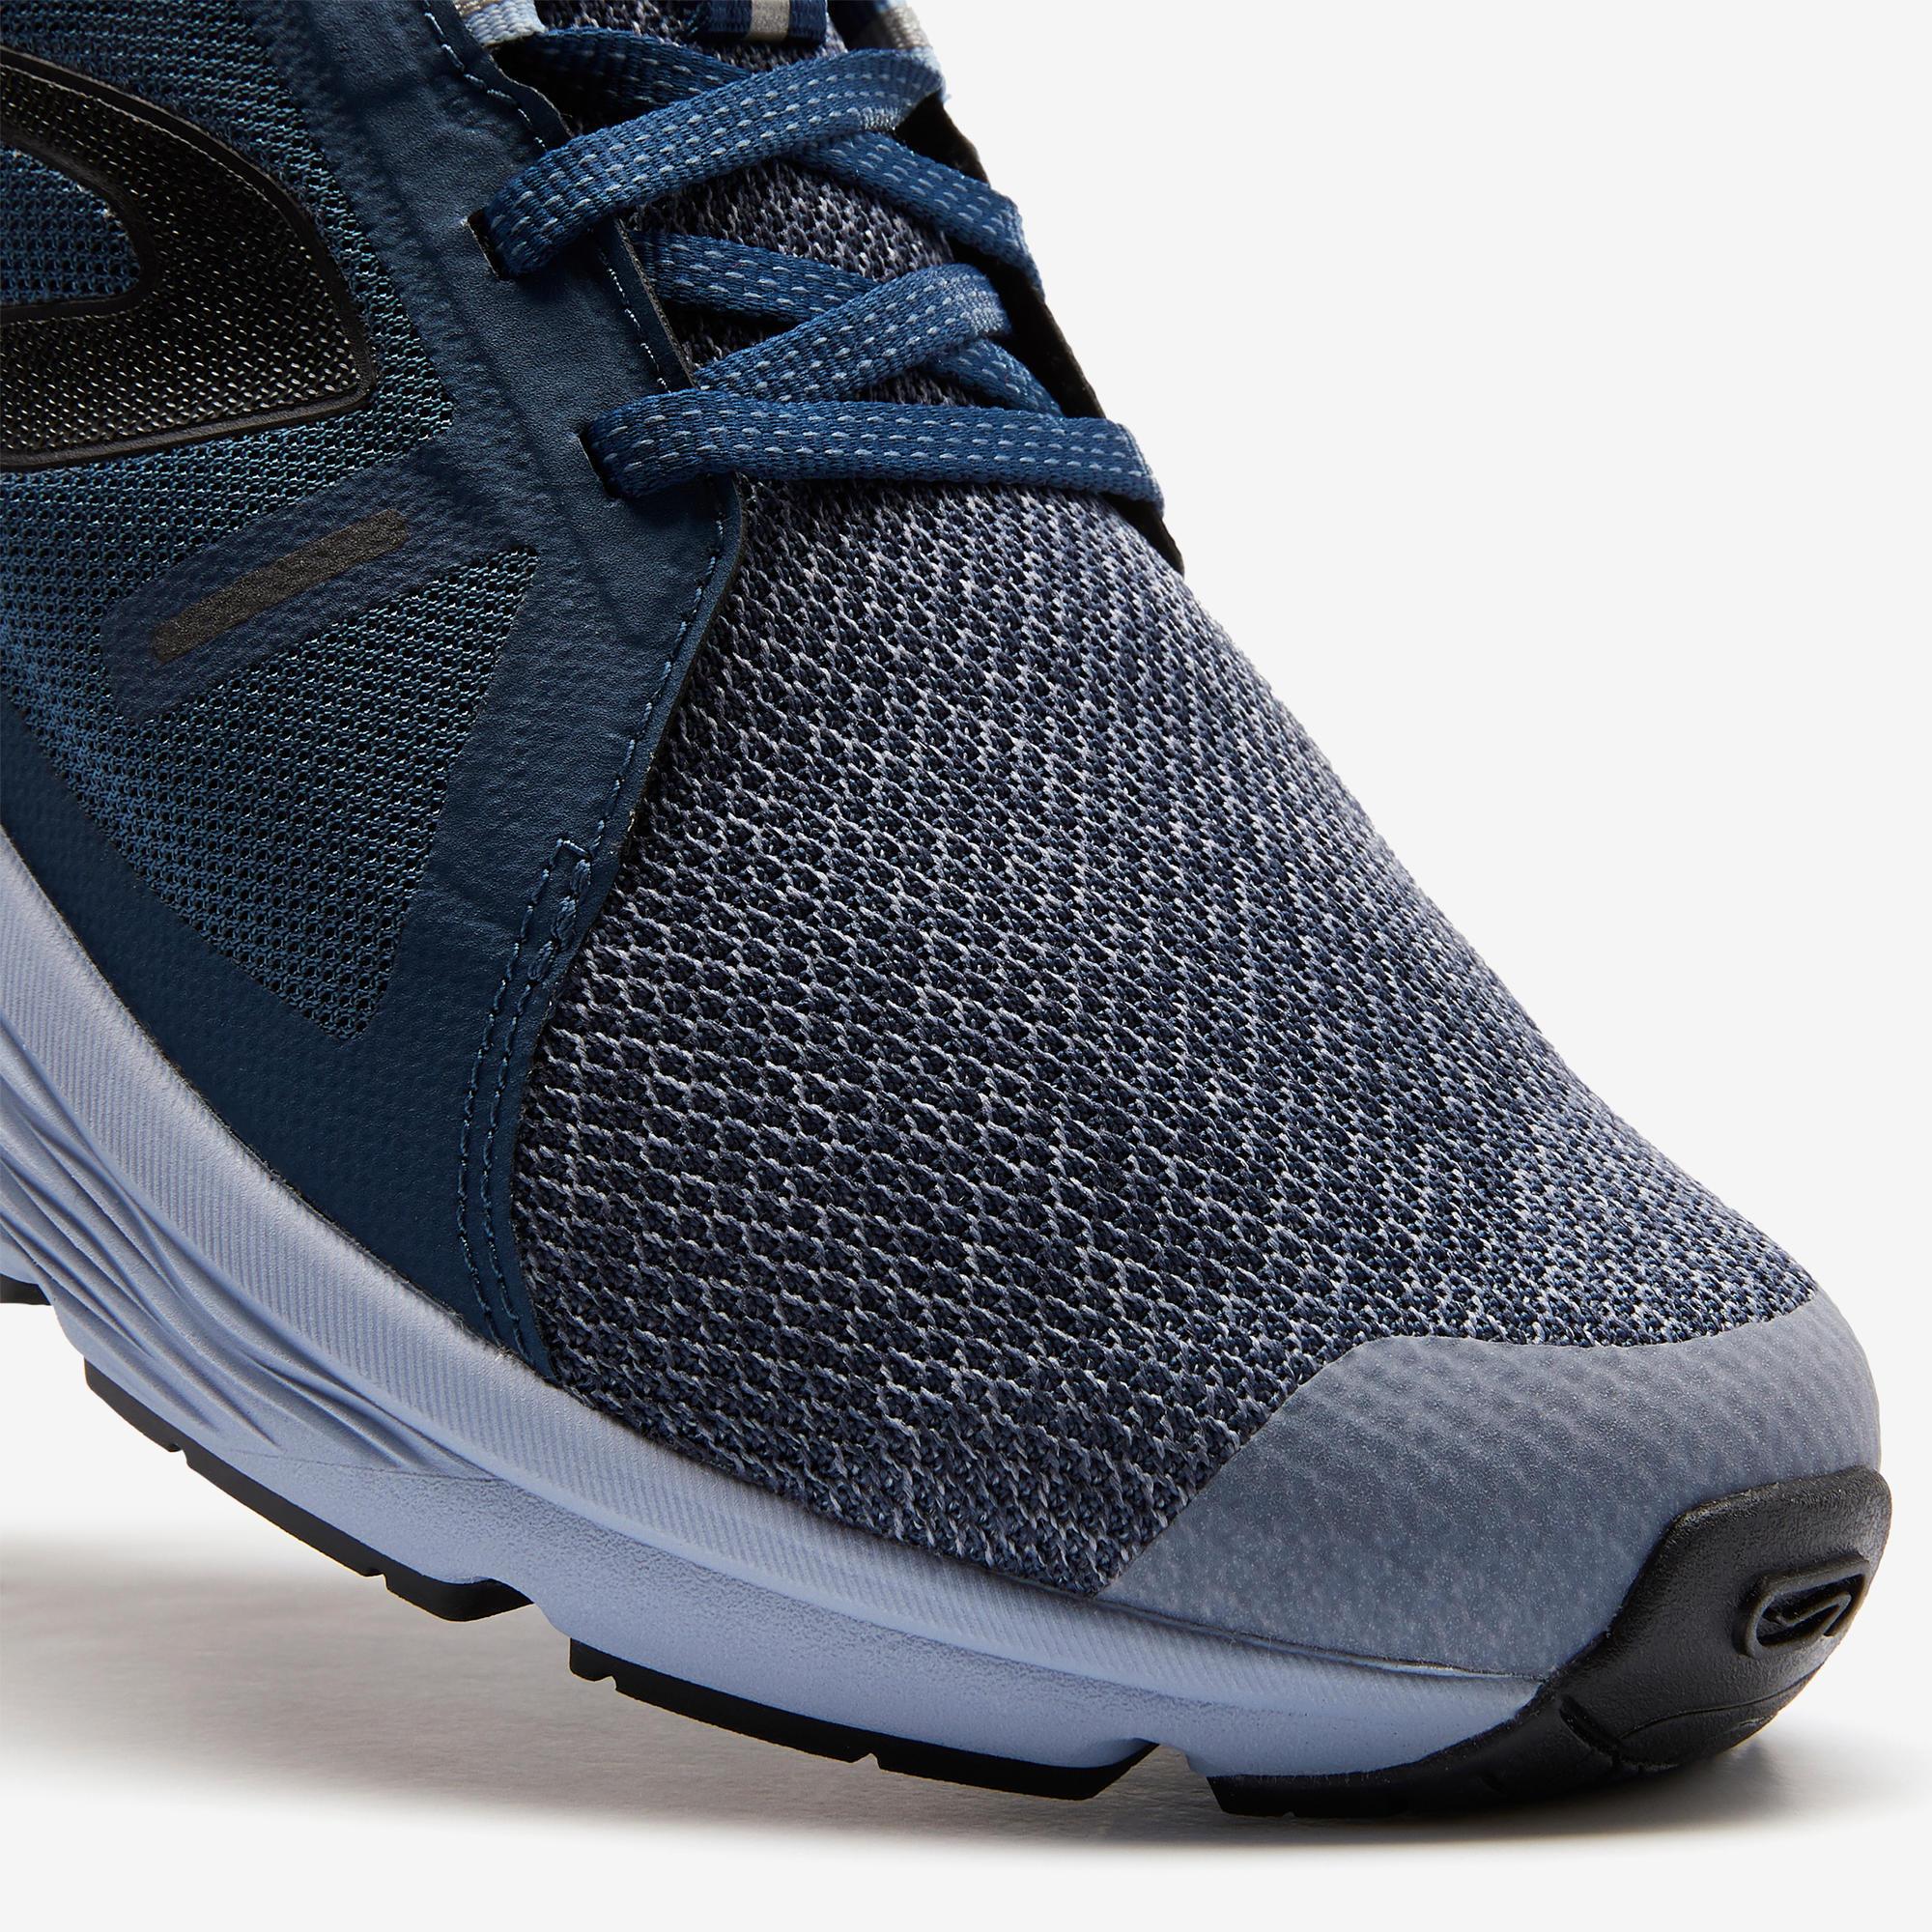 Run Comfort Men's Running Shoes - Decathlon